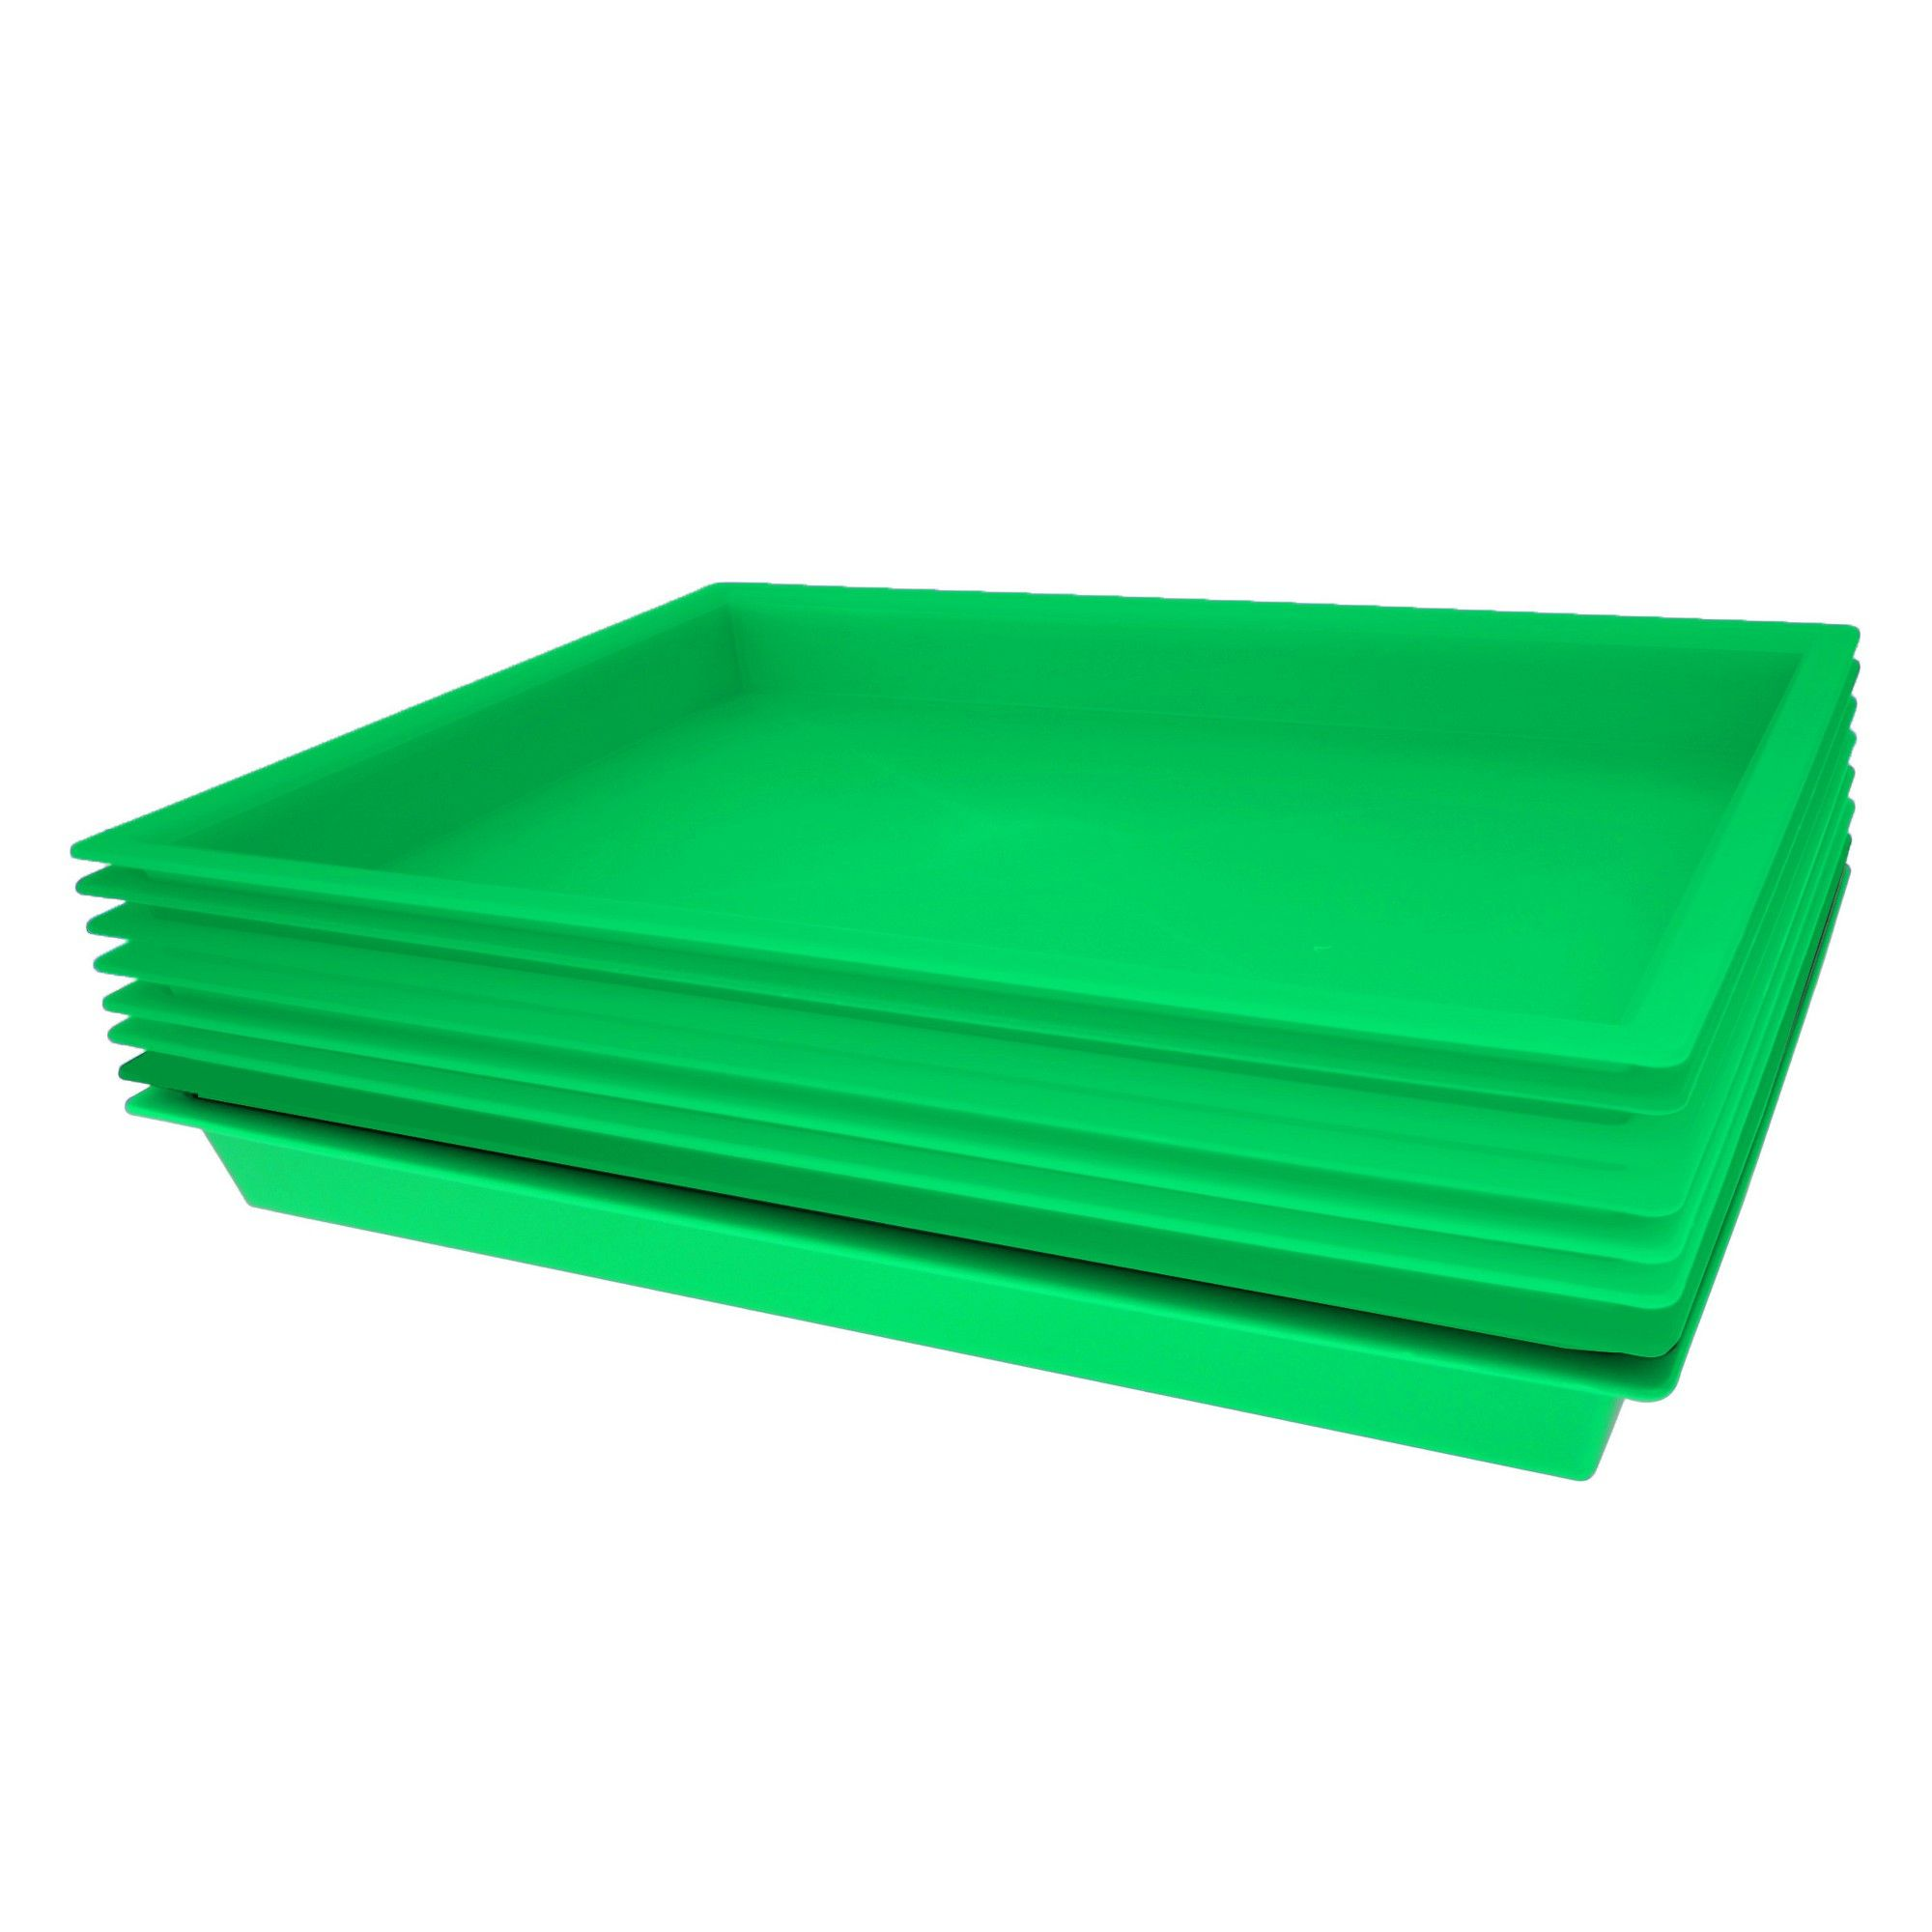 8pk Plastic Tray Green - Bullseye's Playground   Products